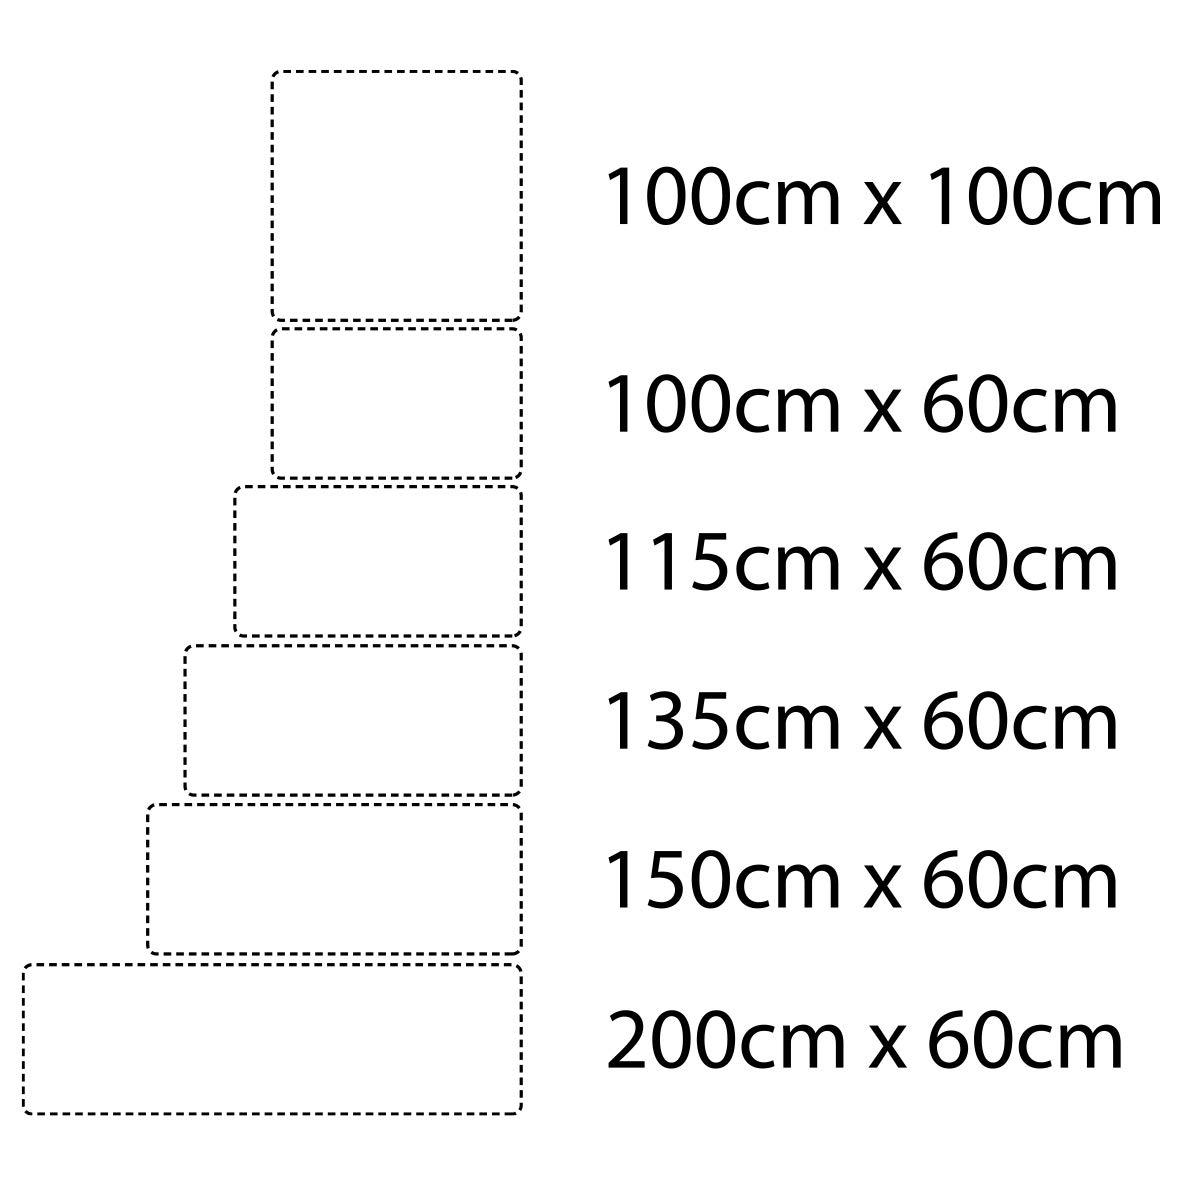 MEGADECOR Cabecero Cama PVC 10mm Decorativo Econ/ómico Modelo Vancouver 100cm x 60cm